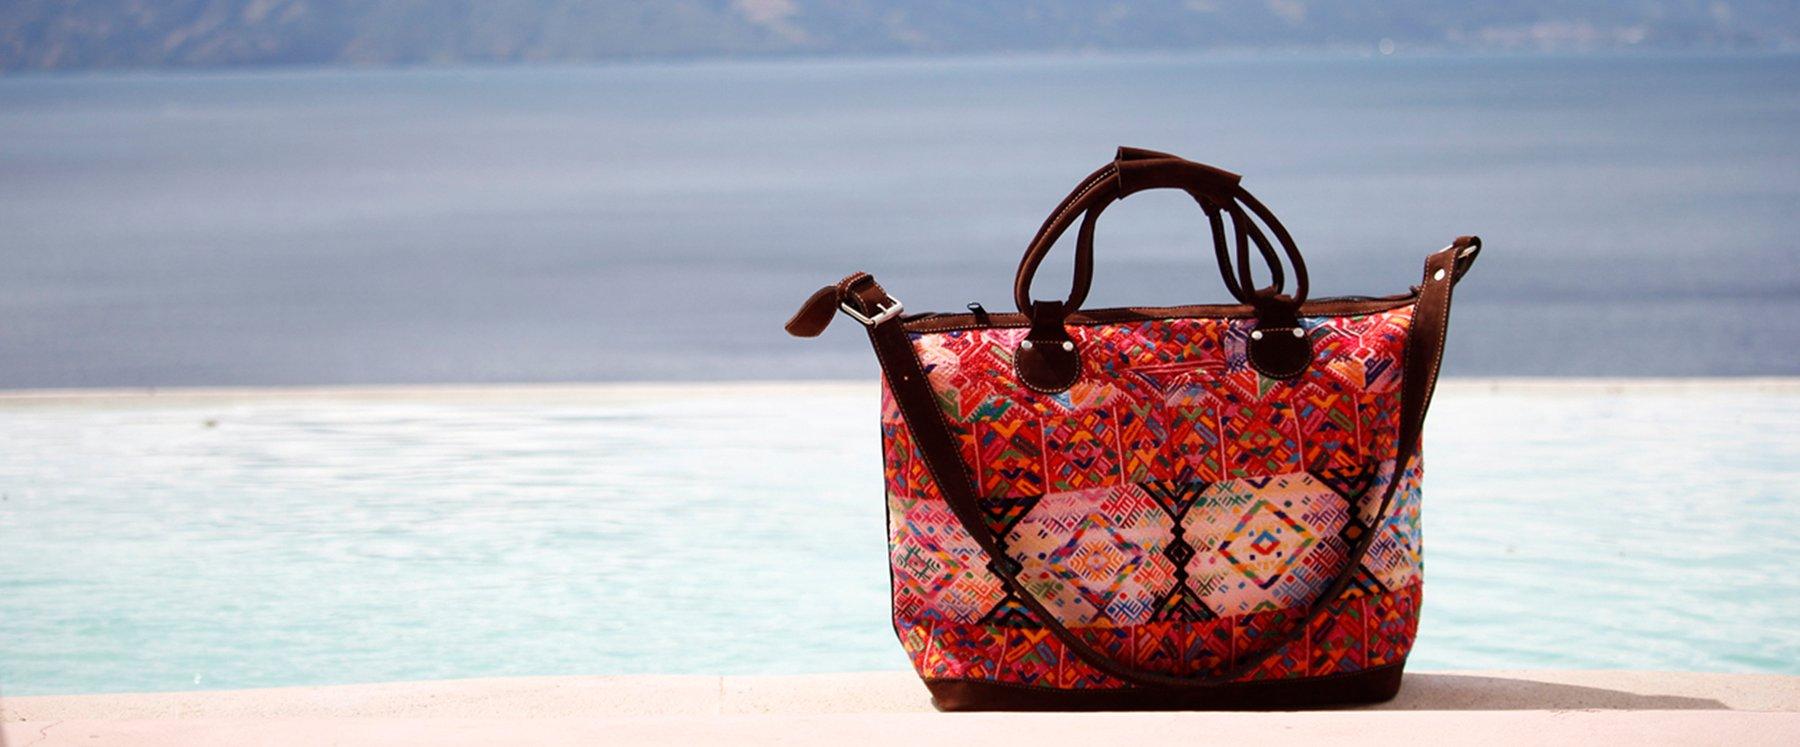 Ethical, handmade women's bags from Guatemala - Hiptipico